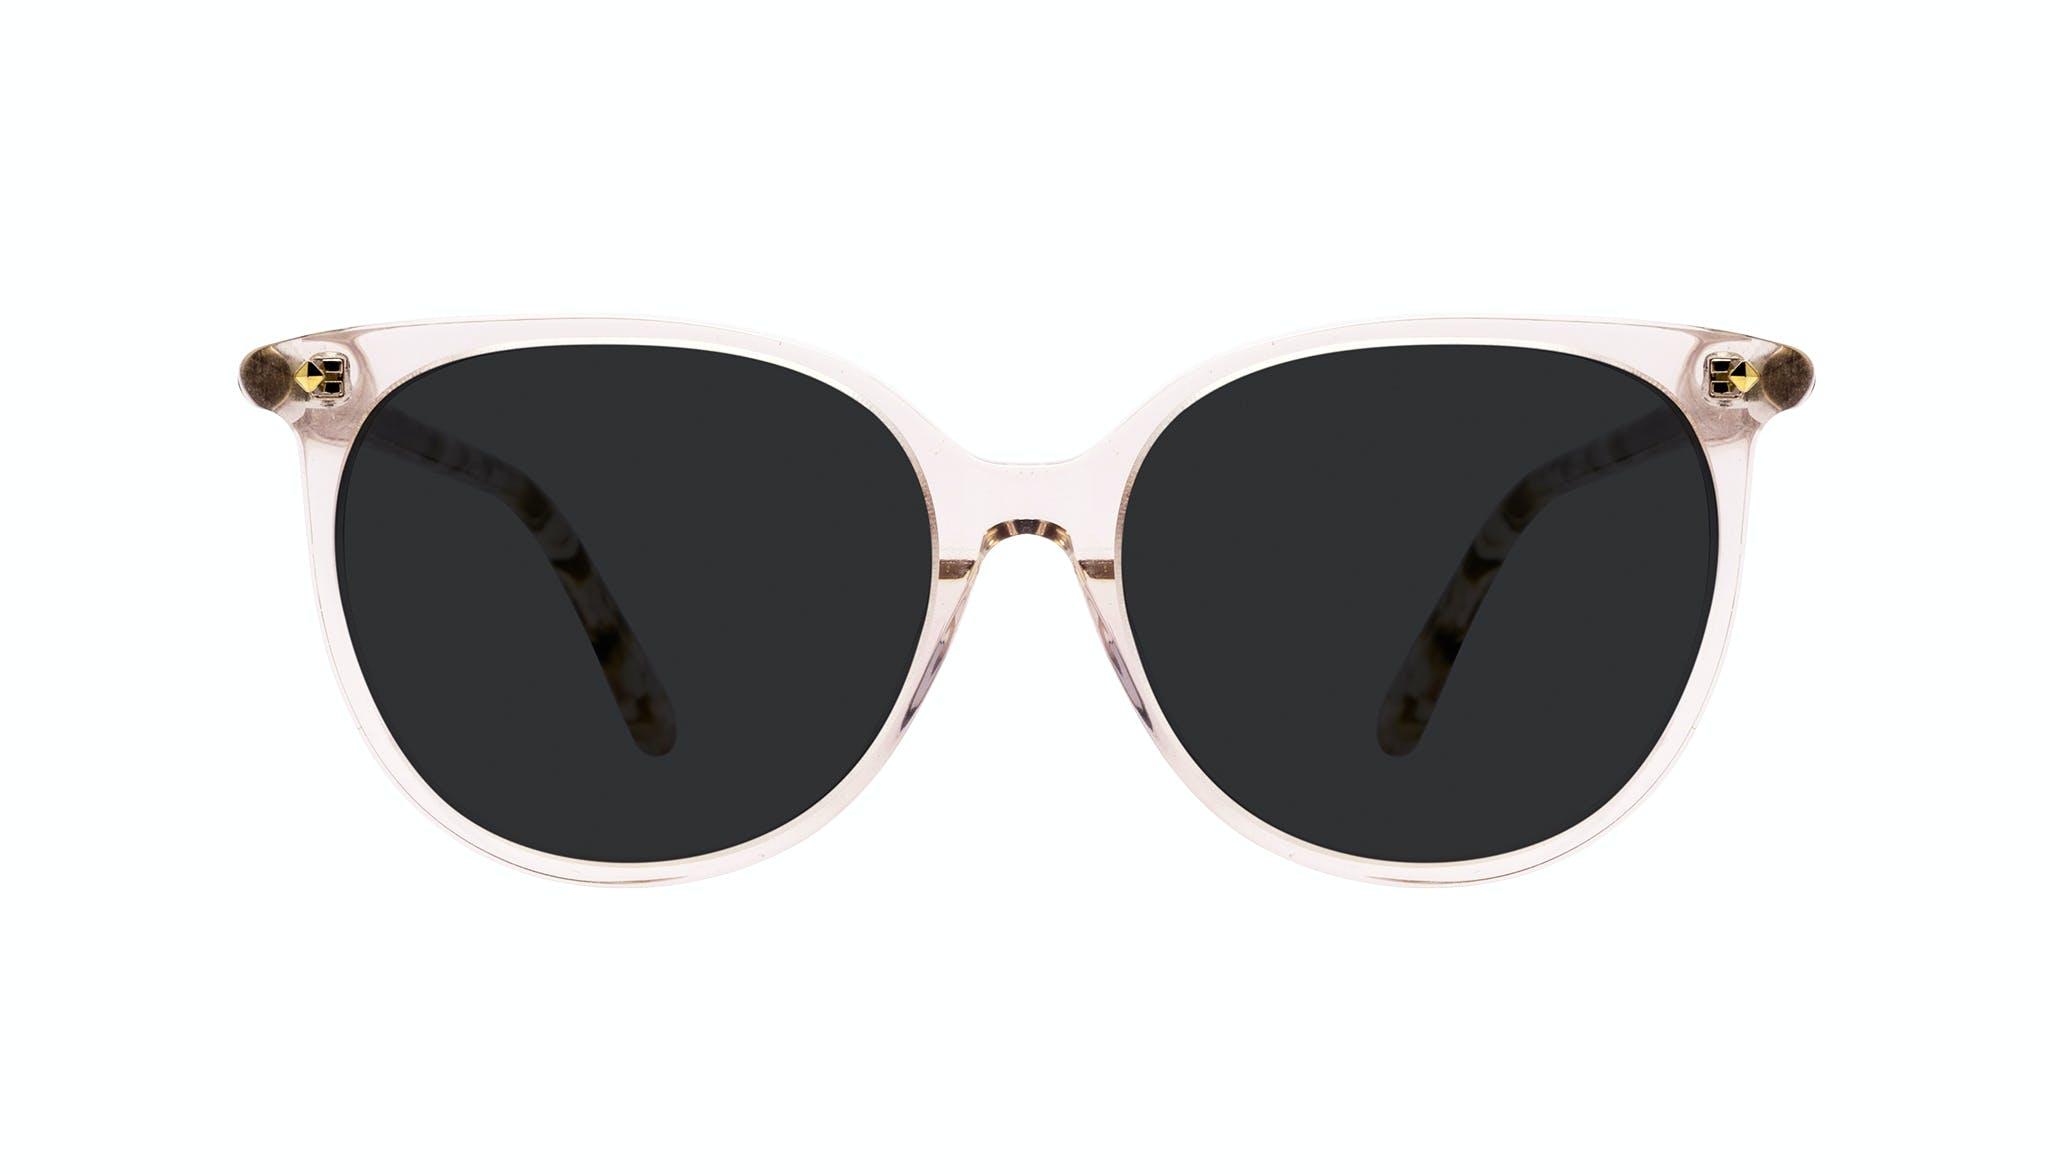 Affordable Fashion Glasses Cat Eye Sunglasses Women Area Petite Rose